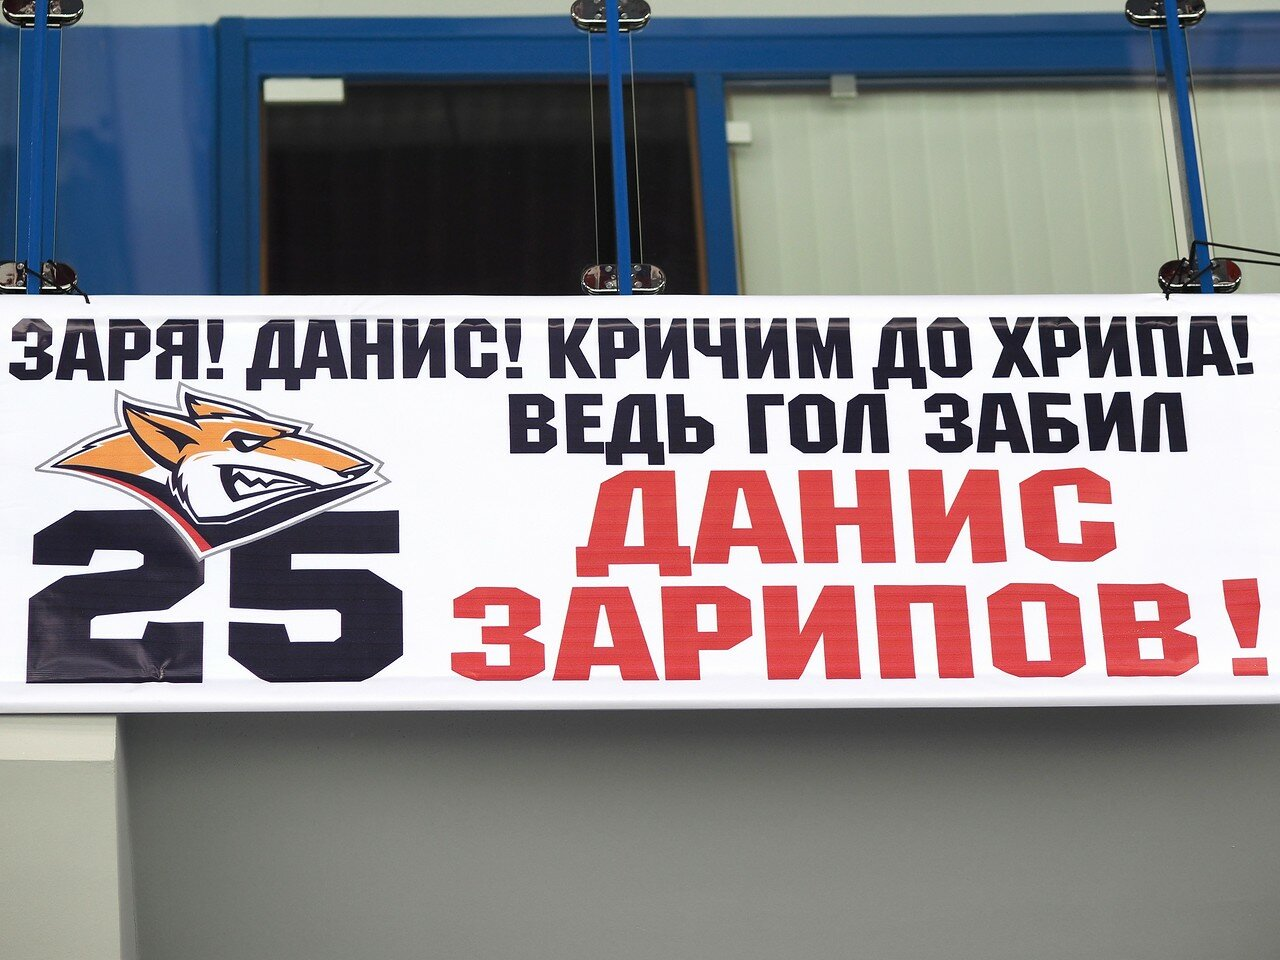 151Восток 1/2 плей-офф Металлург - Сибирь 08.03.2016